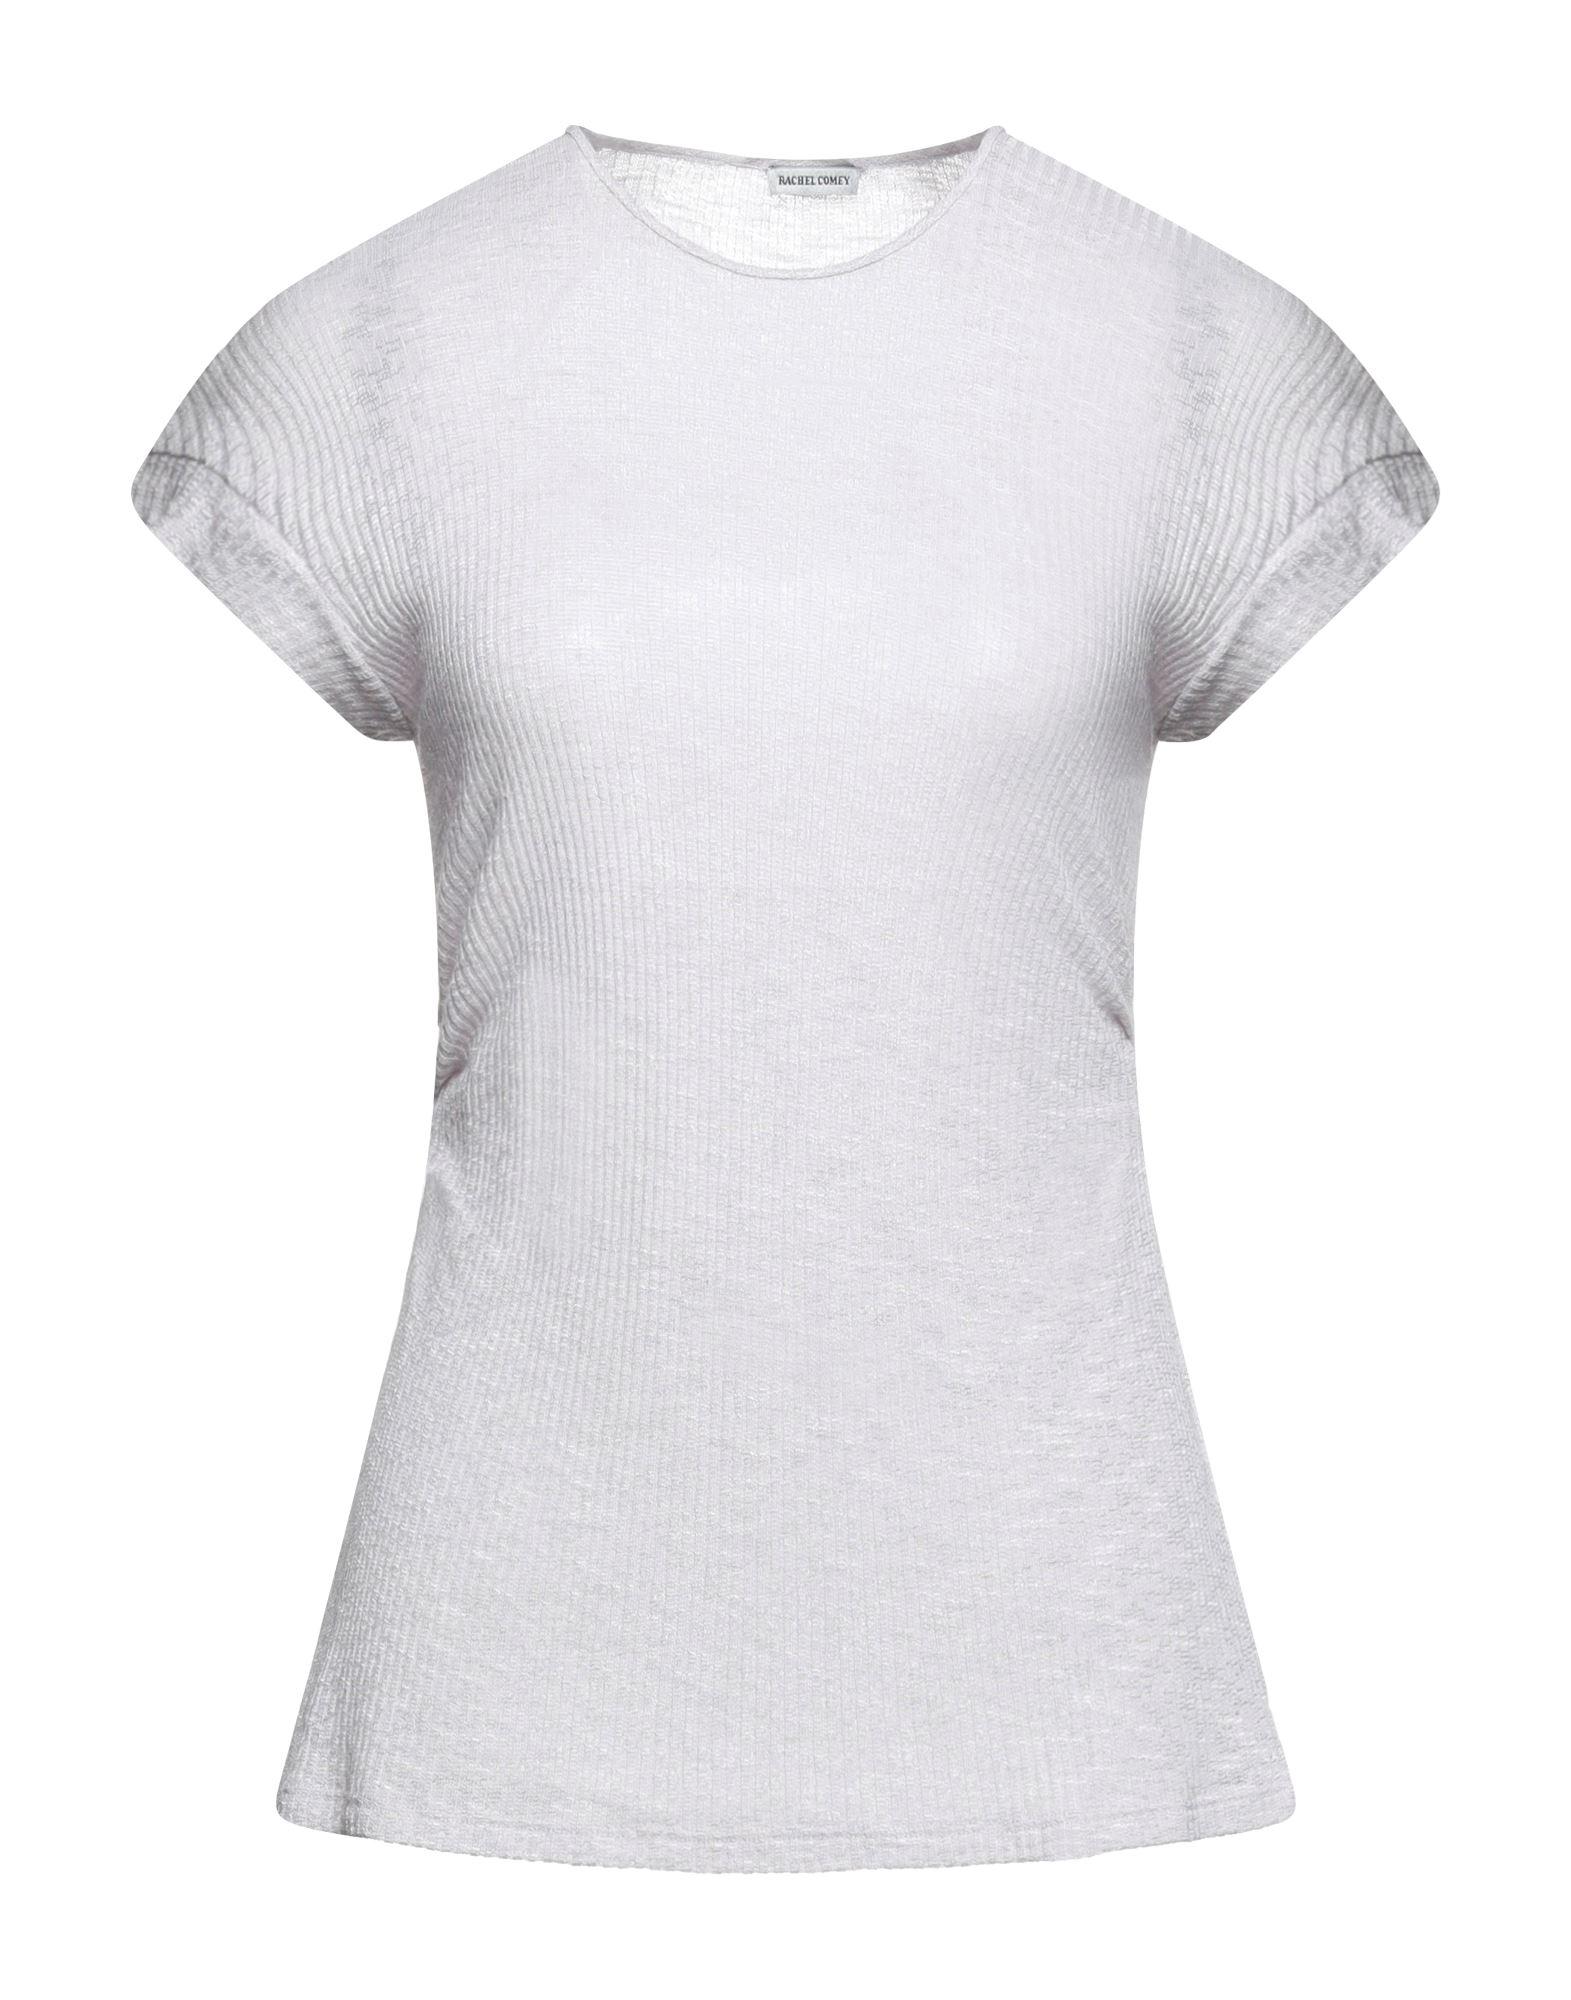 RACHEL COMEY Sweaters - Item 14112786